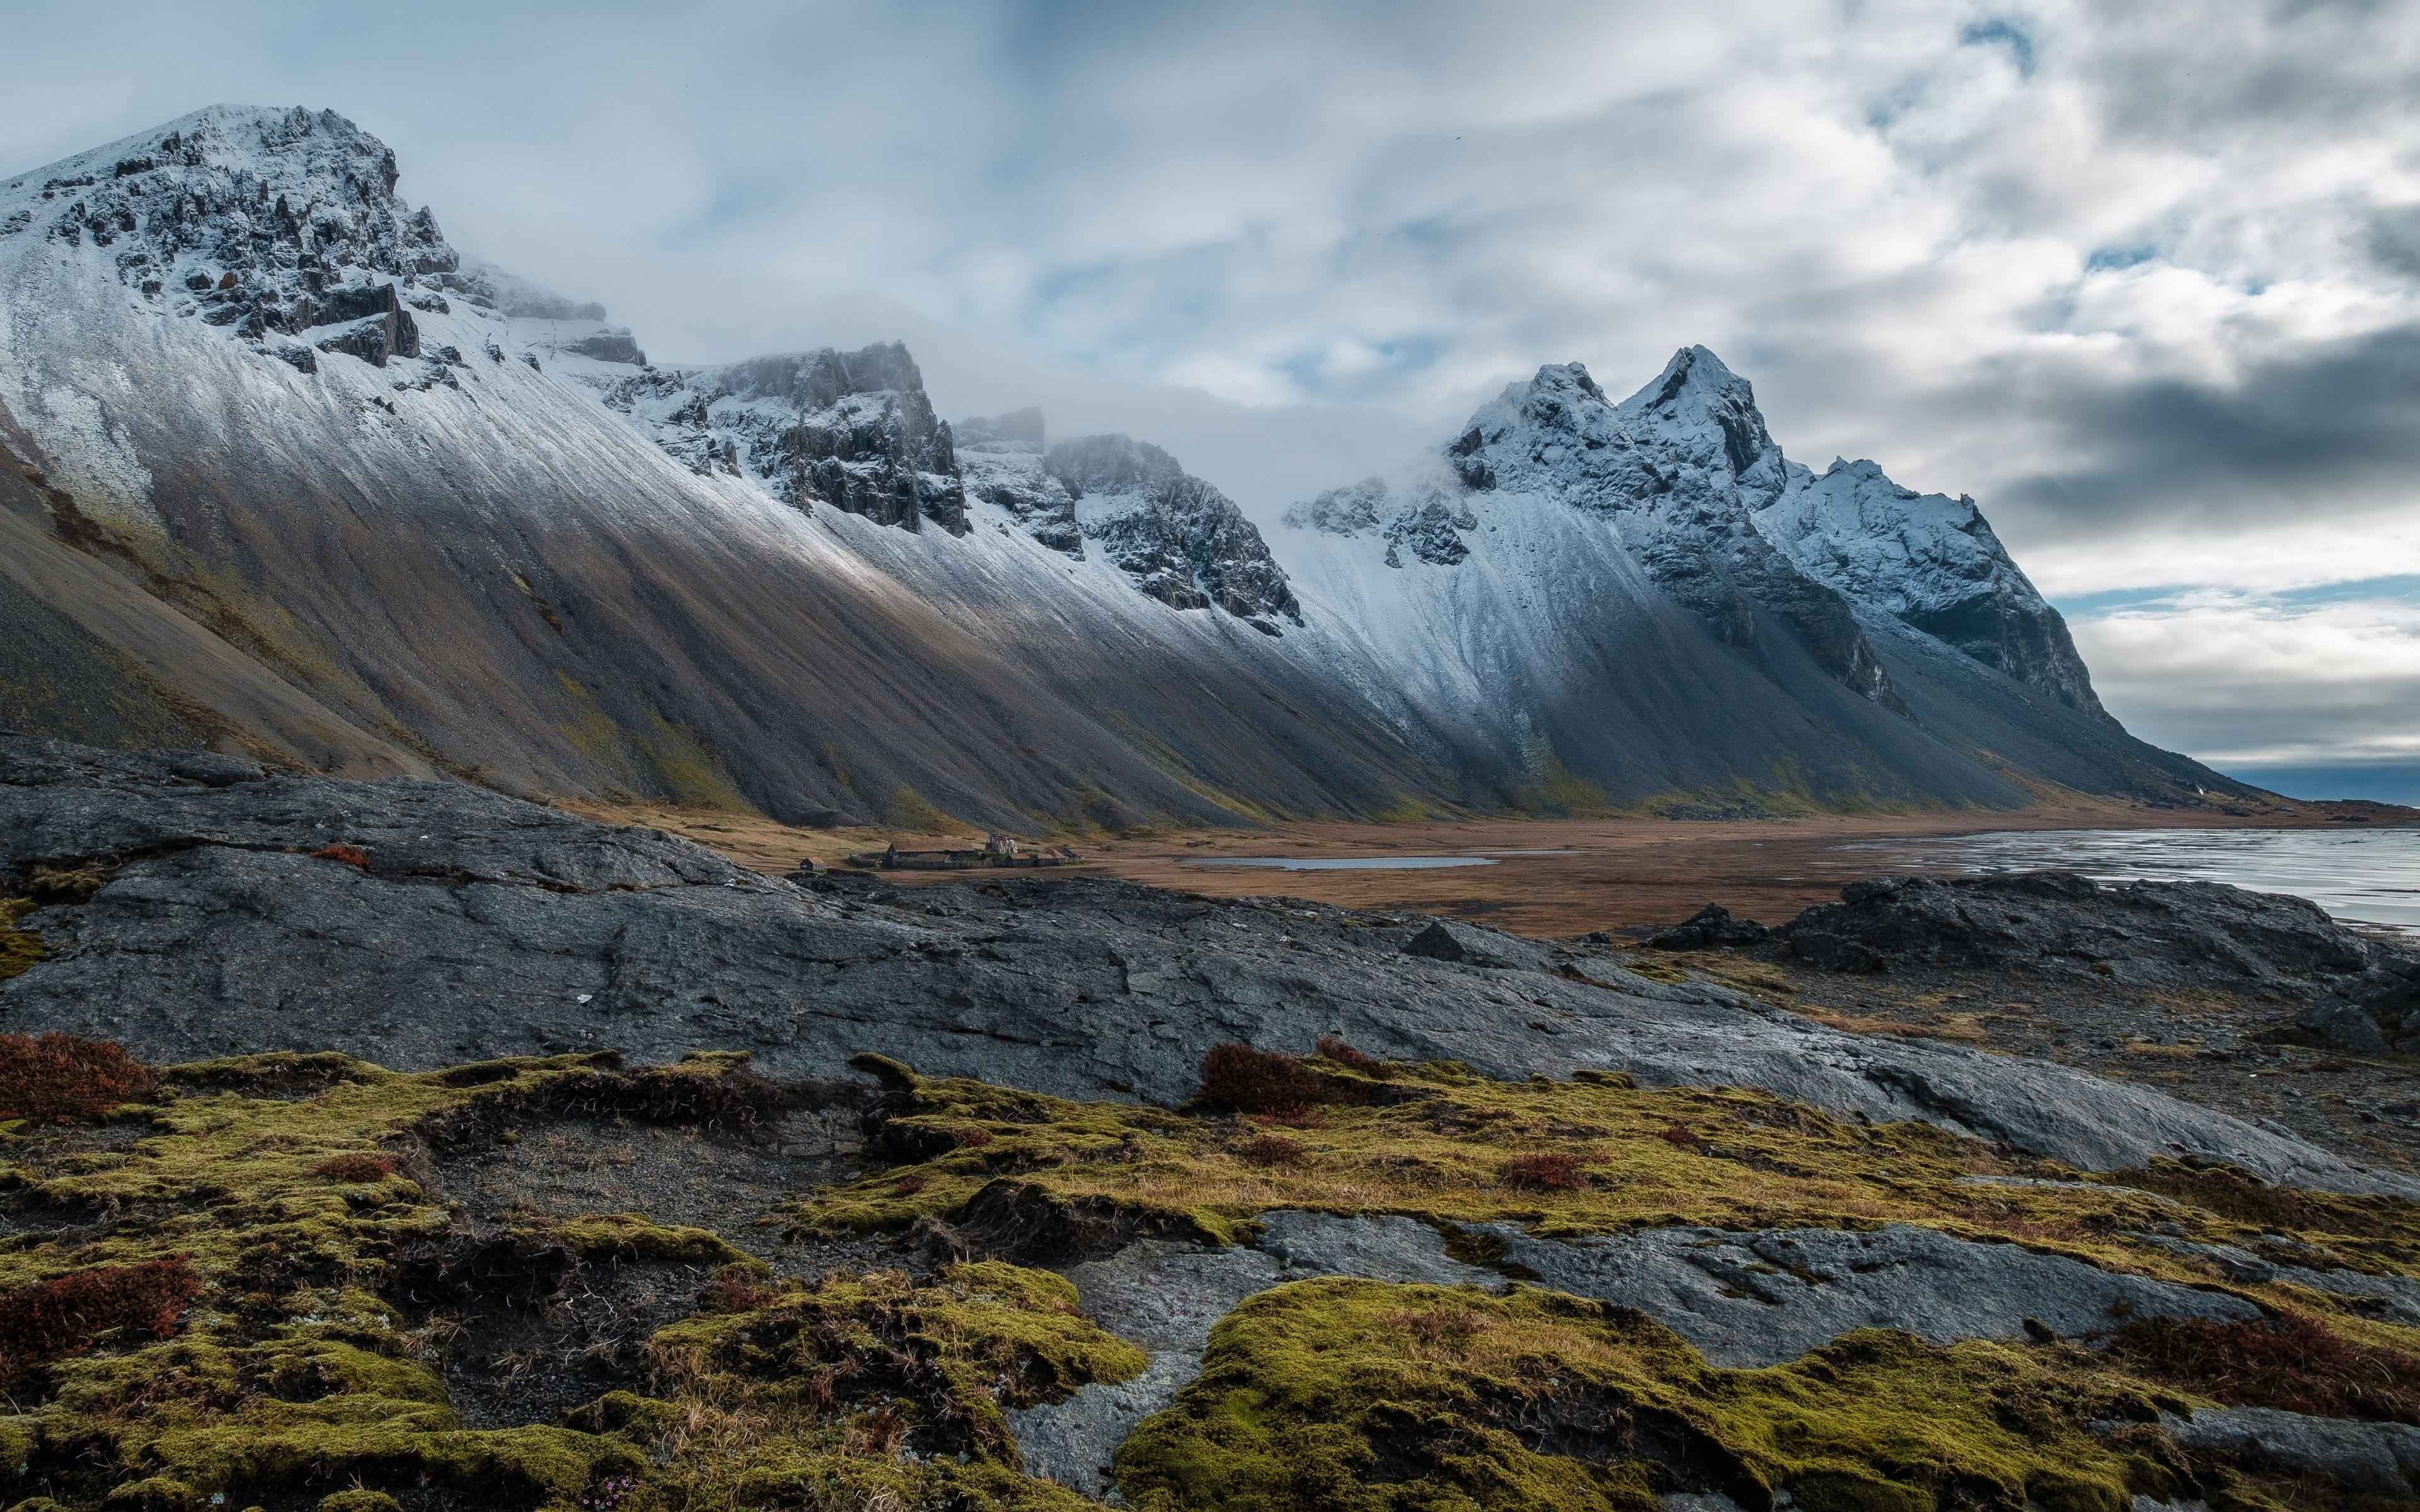 Fondos de pantalla Montañas en paisaje nublado